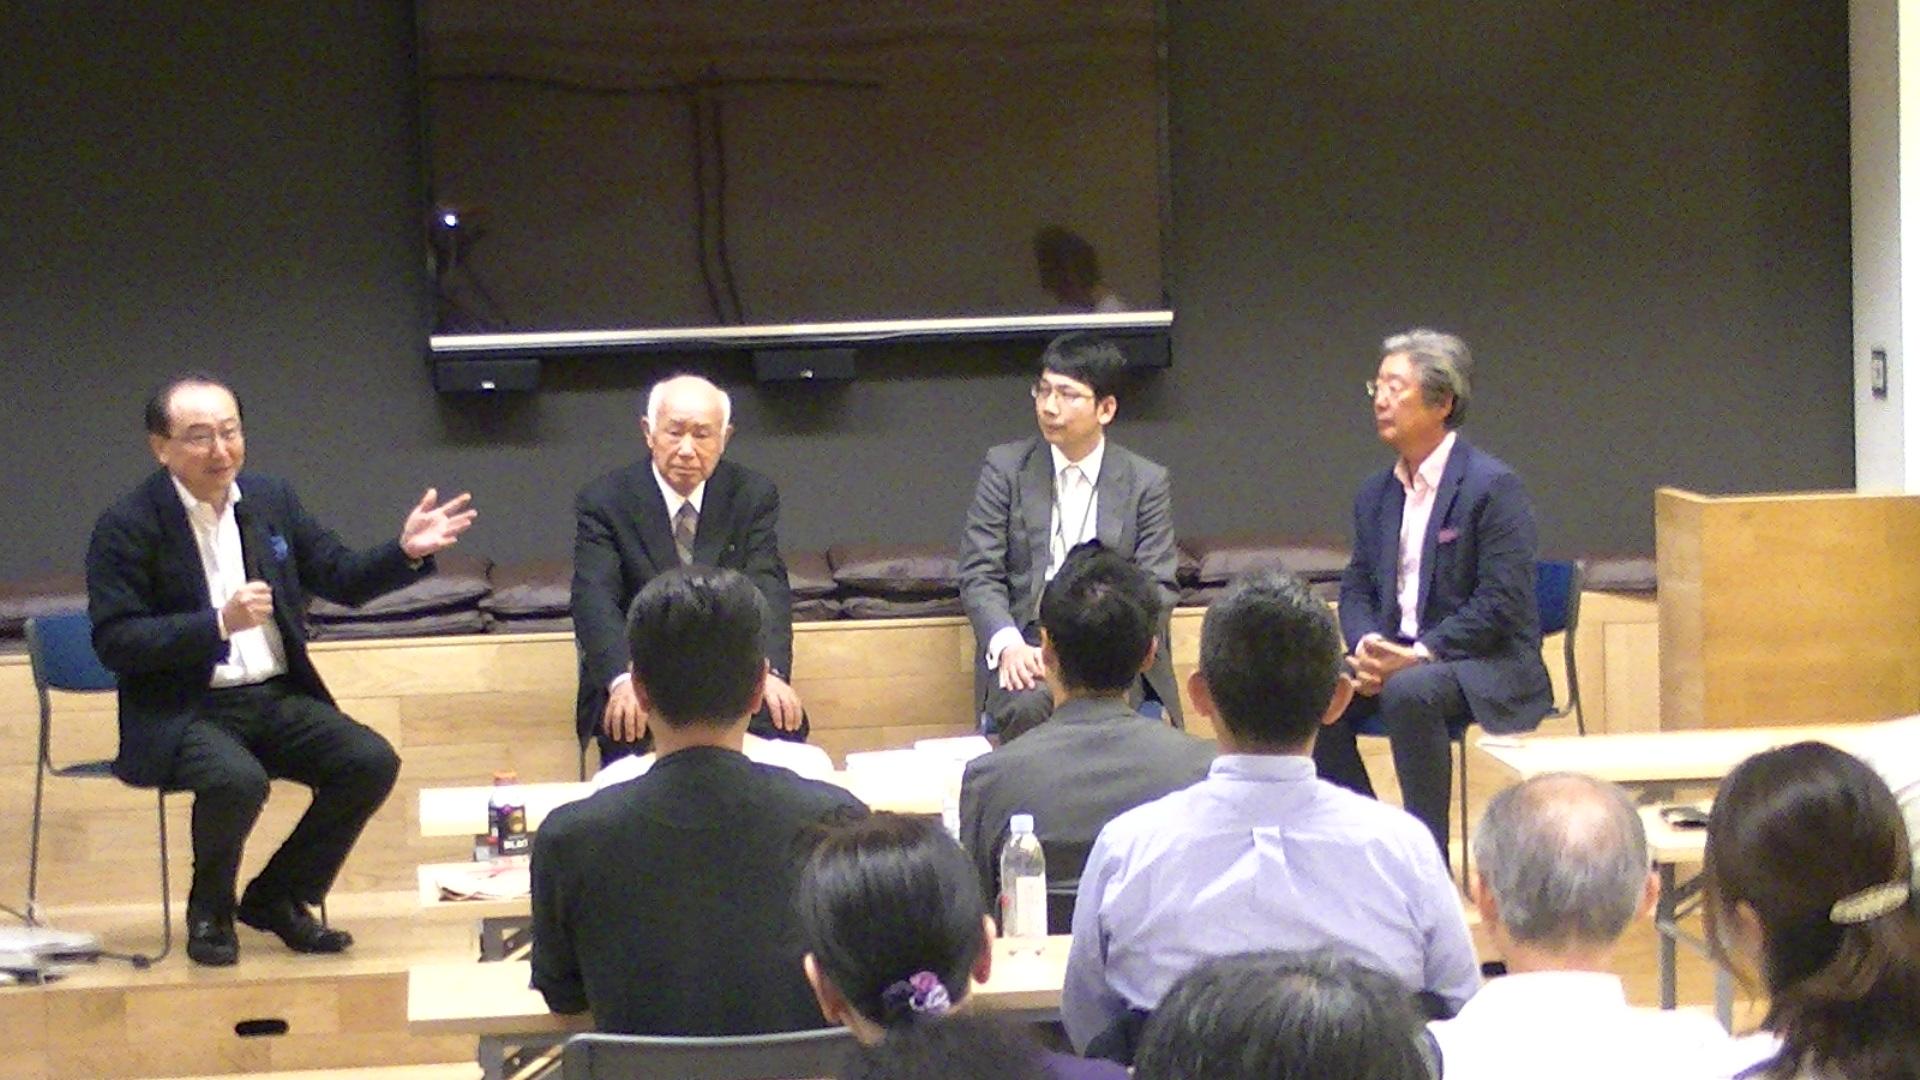 PIC 0029 - 4月1日東京思風塾の開催になります。